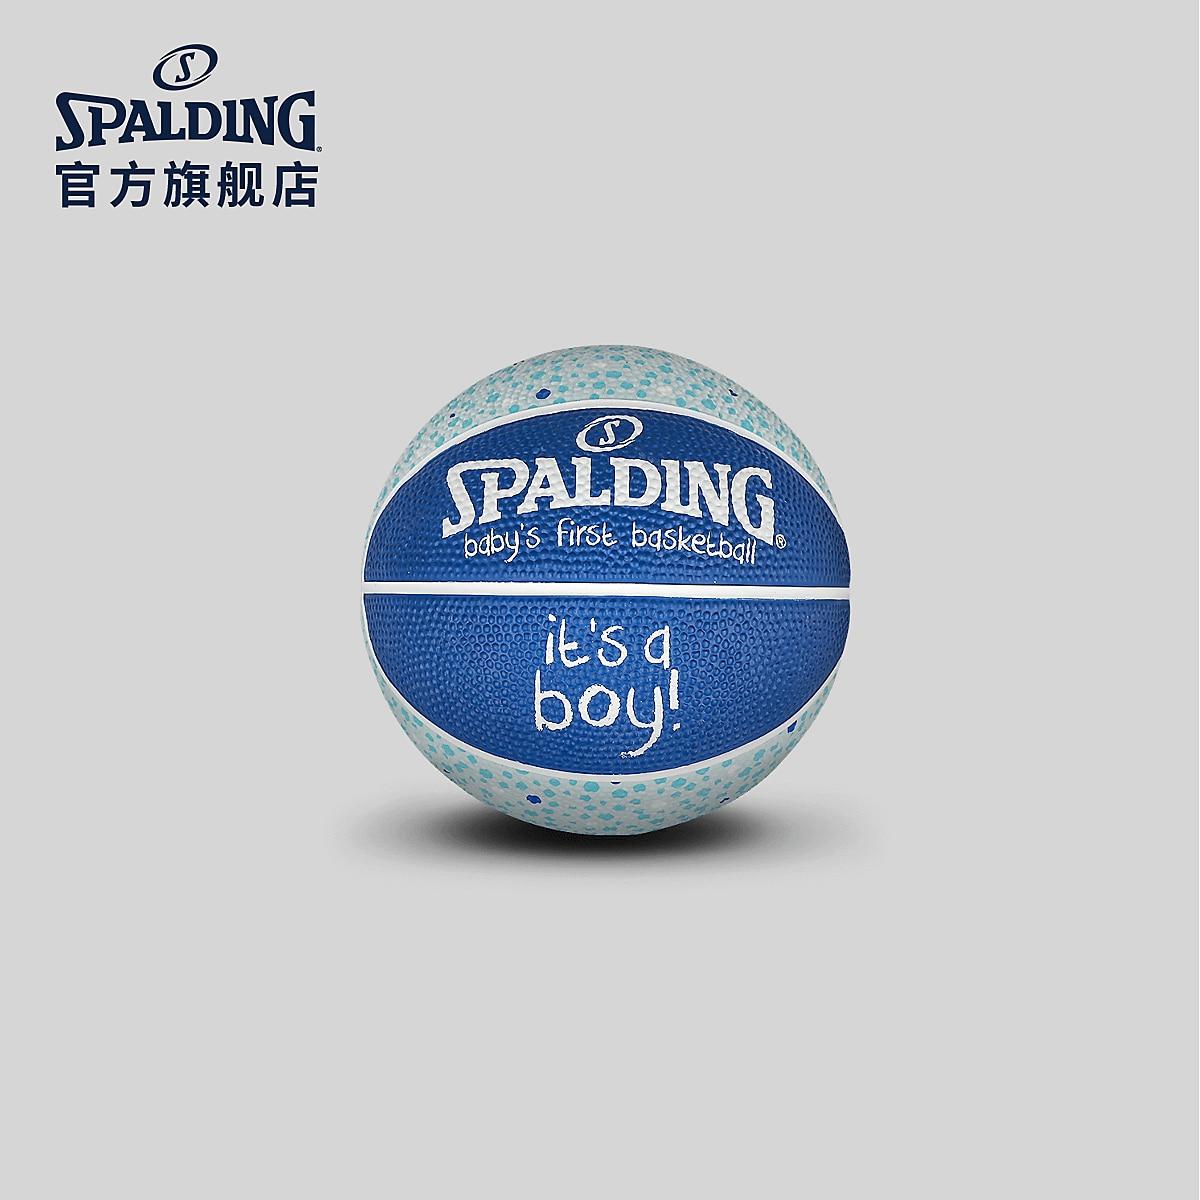 SPALDING Official Flagship Store Children's Ball Outdoor Basketball Boy No. 1 Rubber Basketball